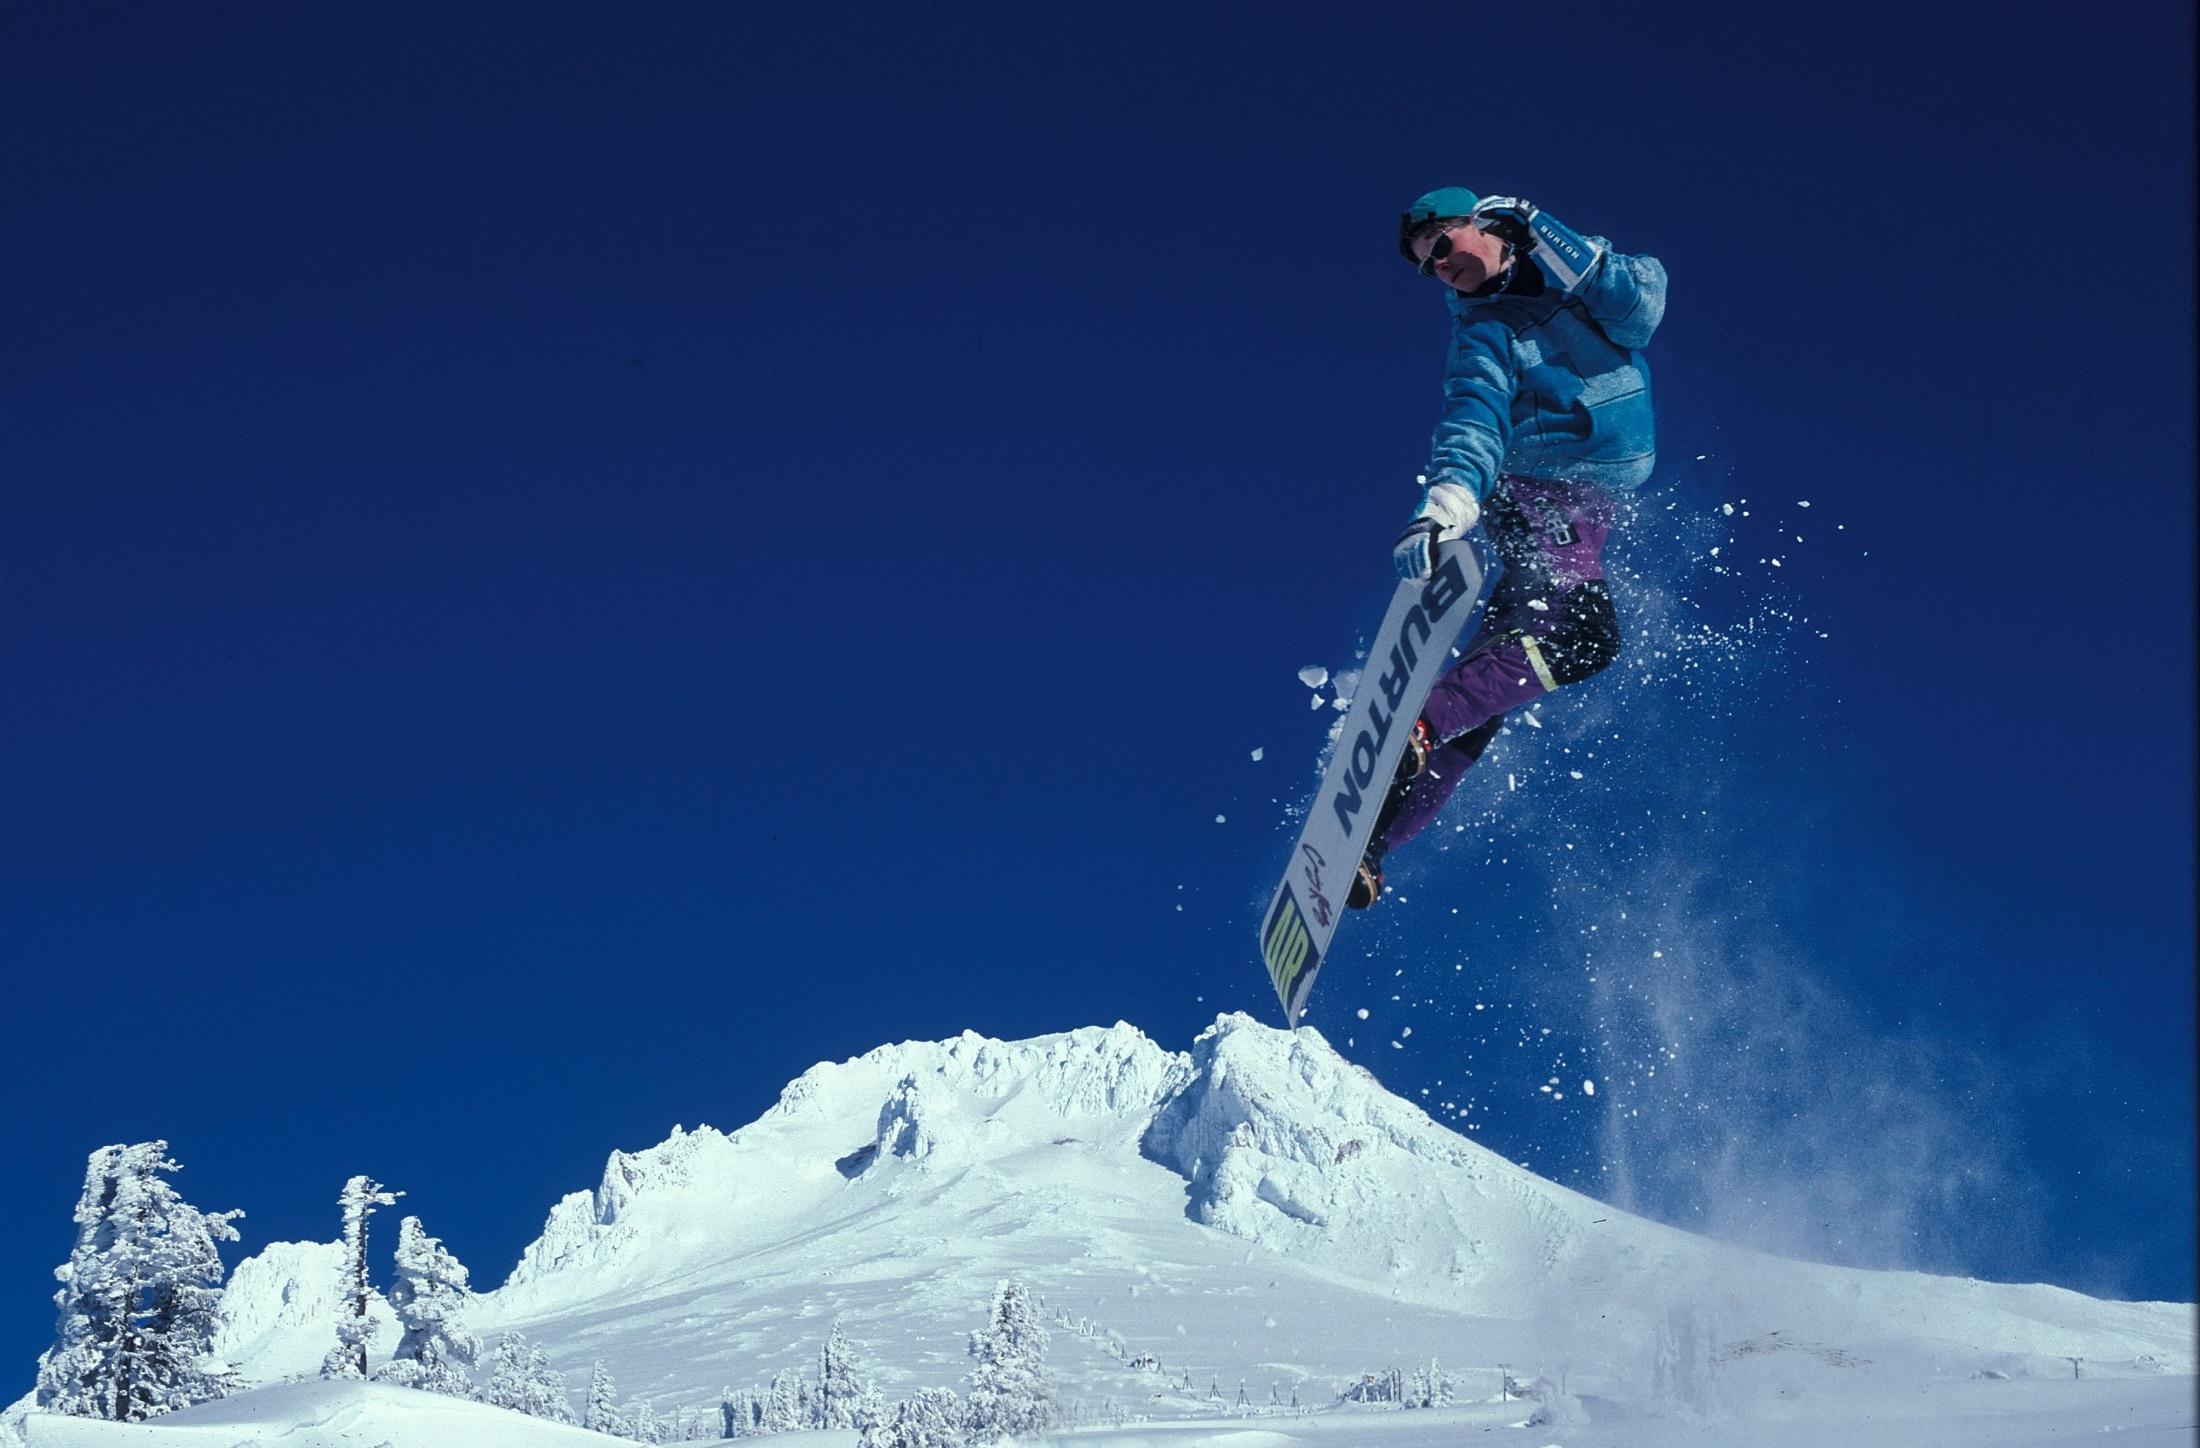 Black And White Flower Wallpaper Man Snowboarding During Daytime 183 Free Stock Photo